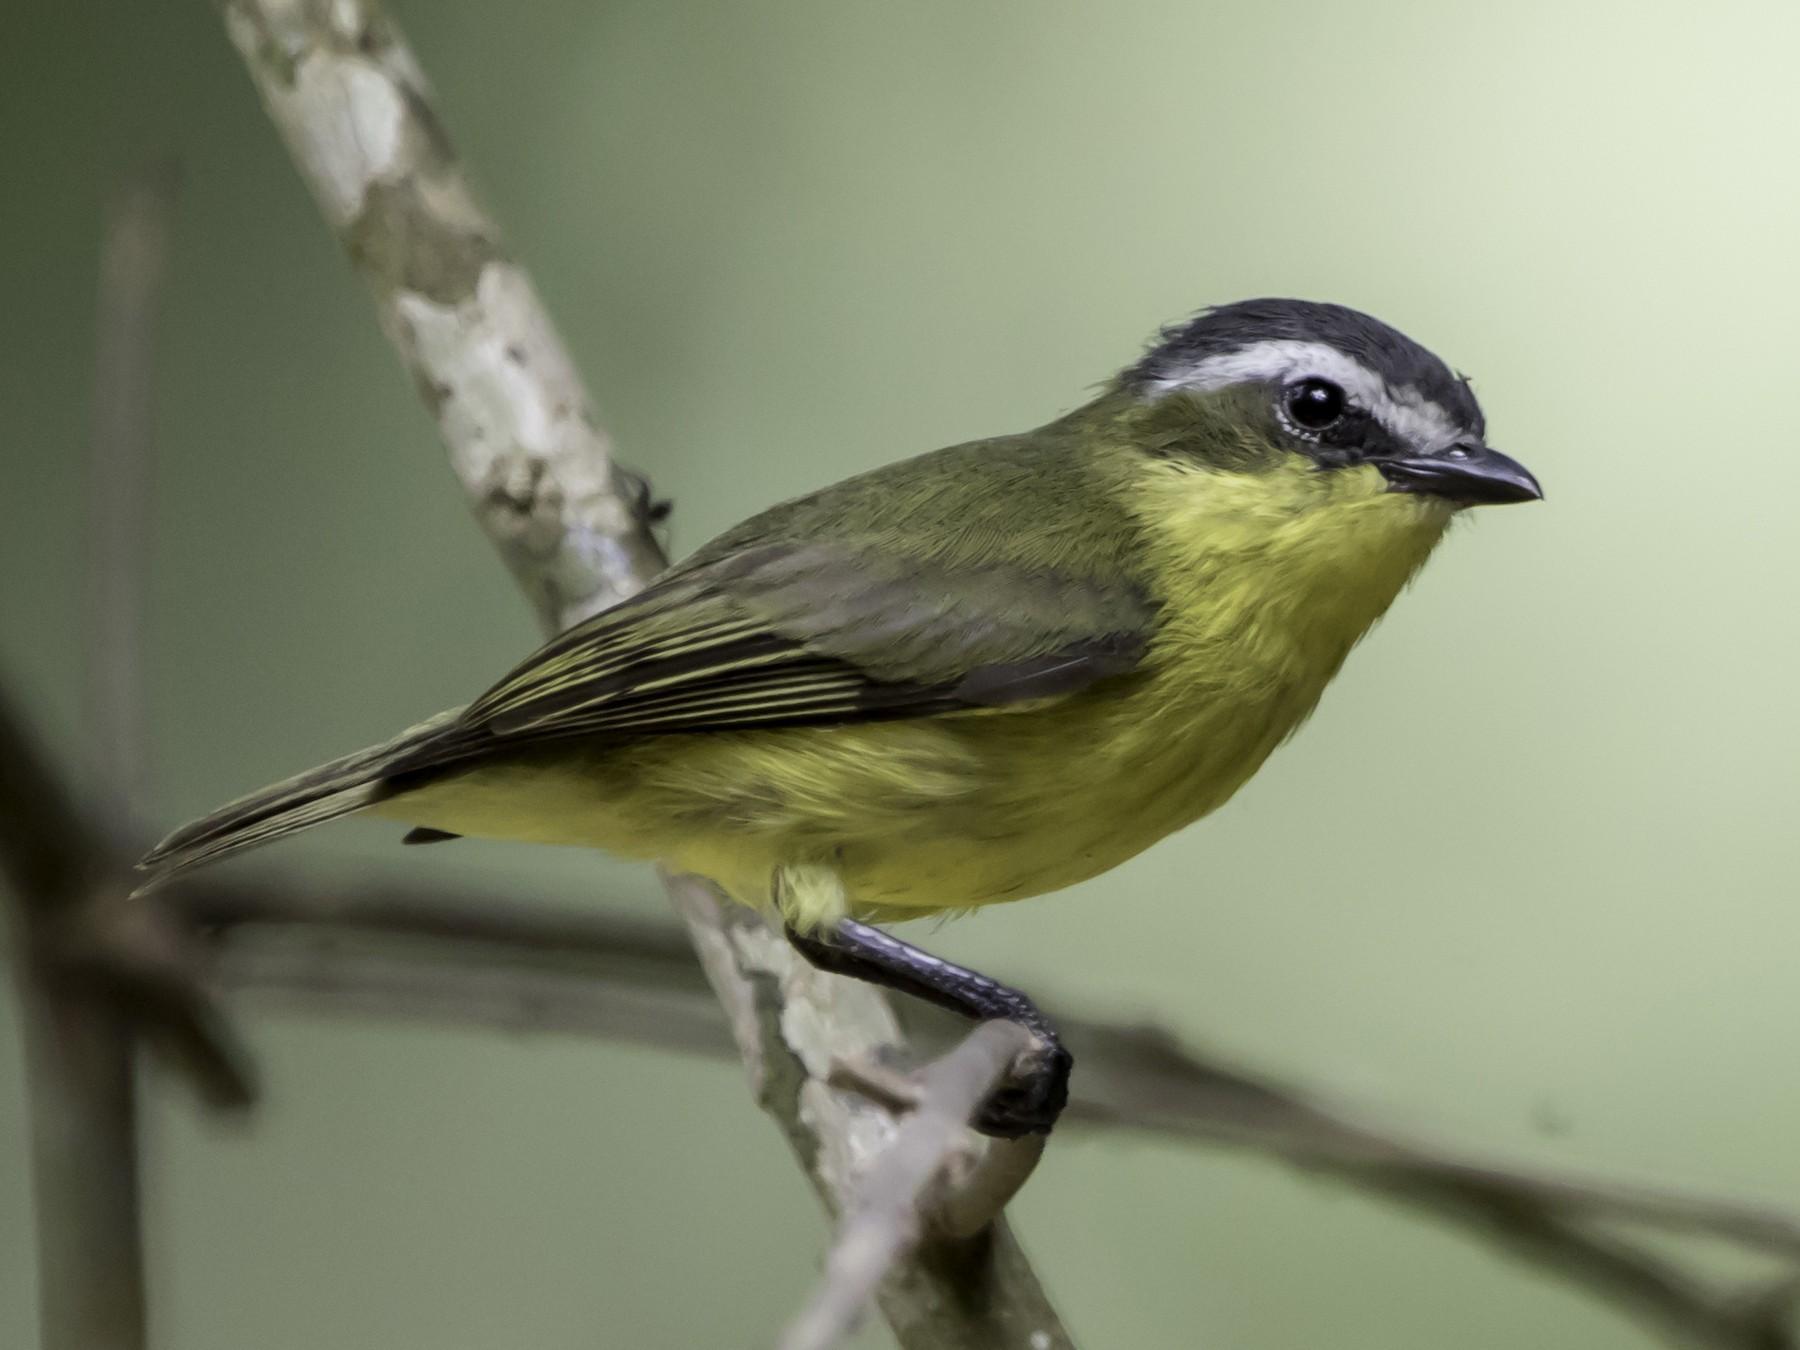 Yellow-bellied Tyrannulet - Jorge Eduardo  Ruano